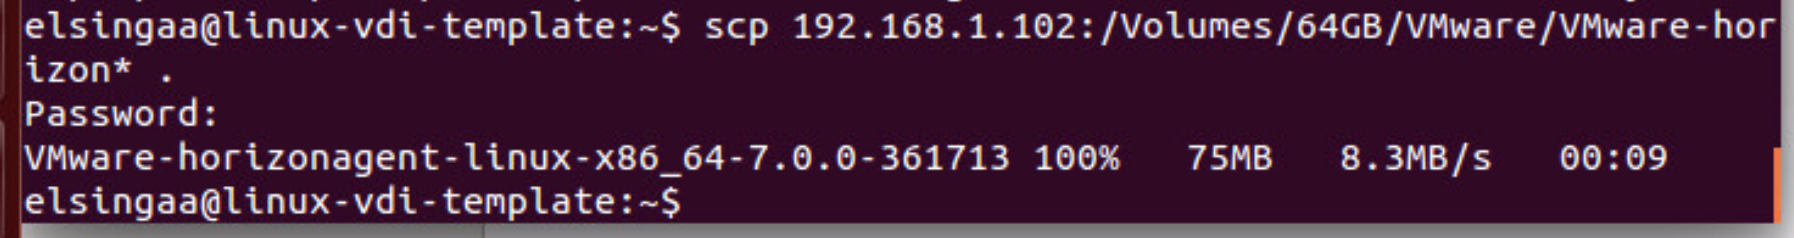 Linux Desktops with Horizon